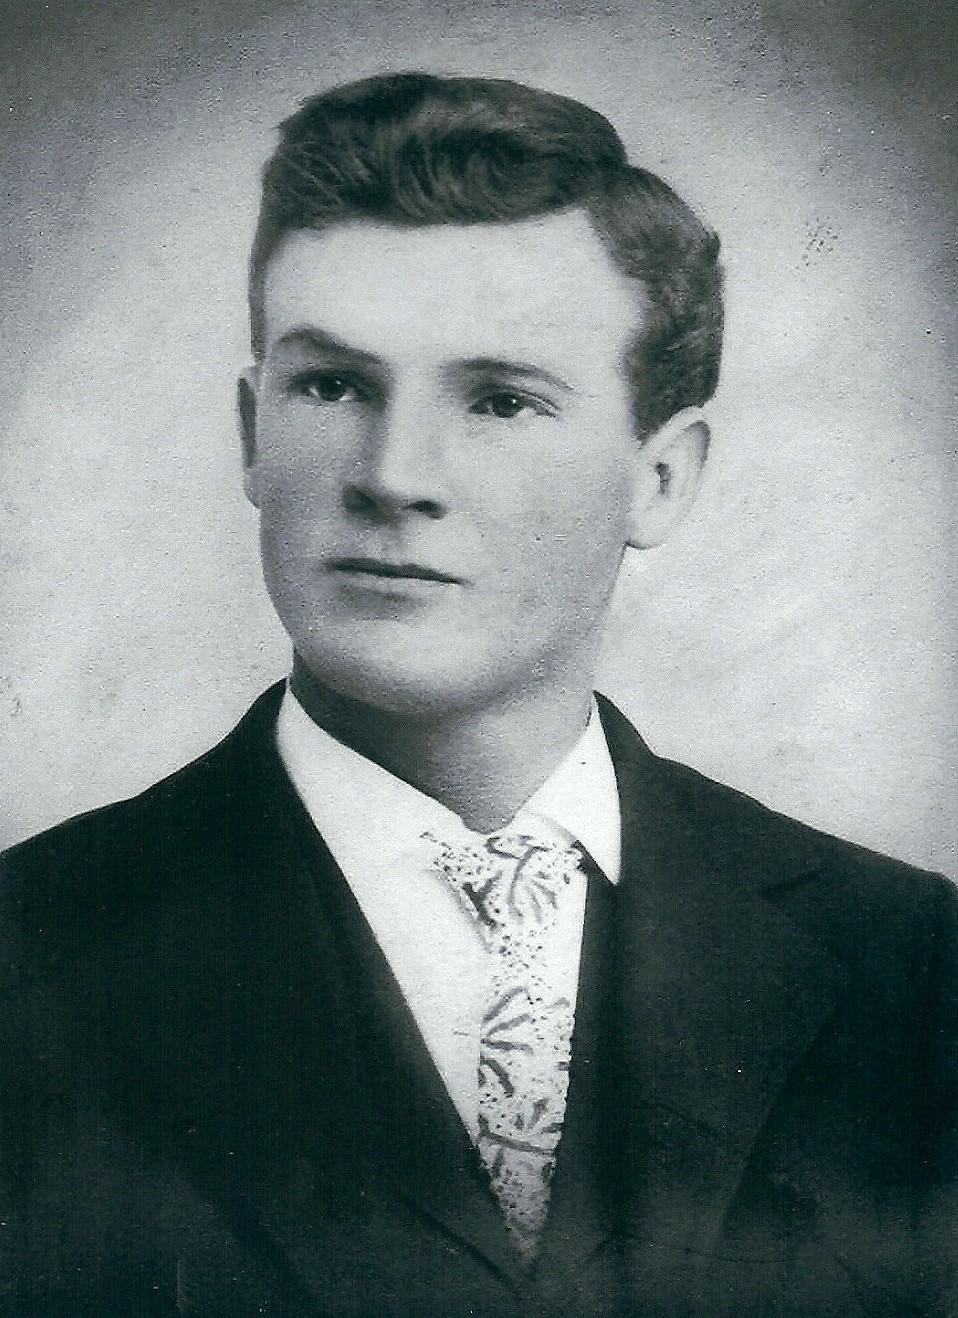 Burbidge, Ward Parley